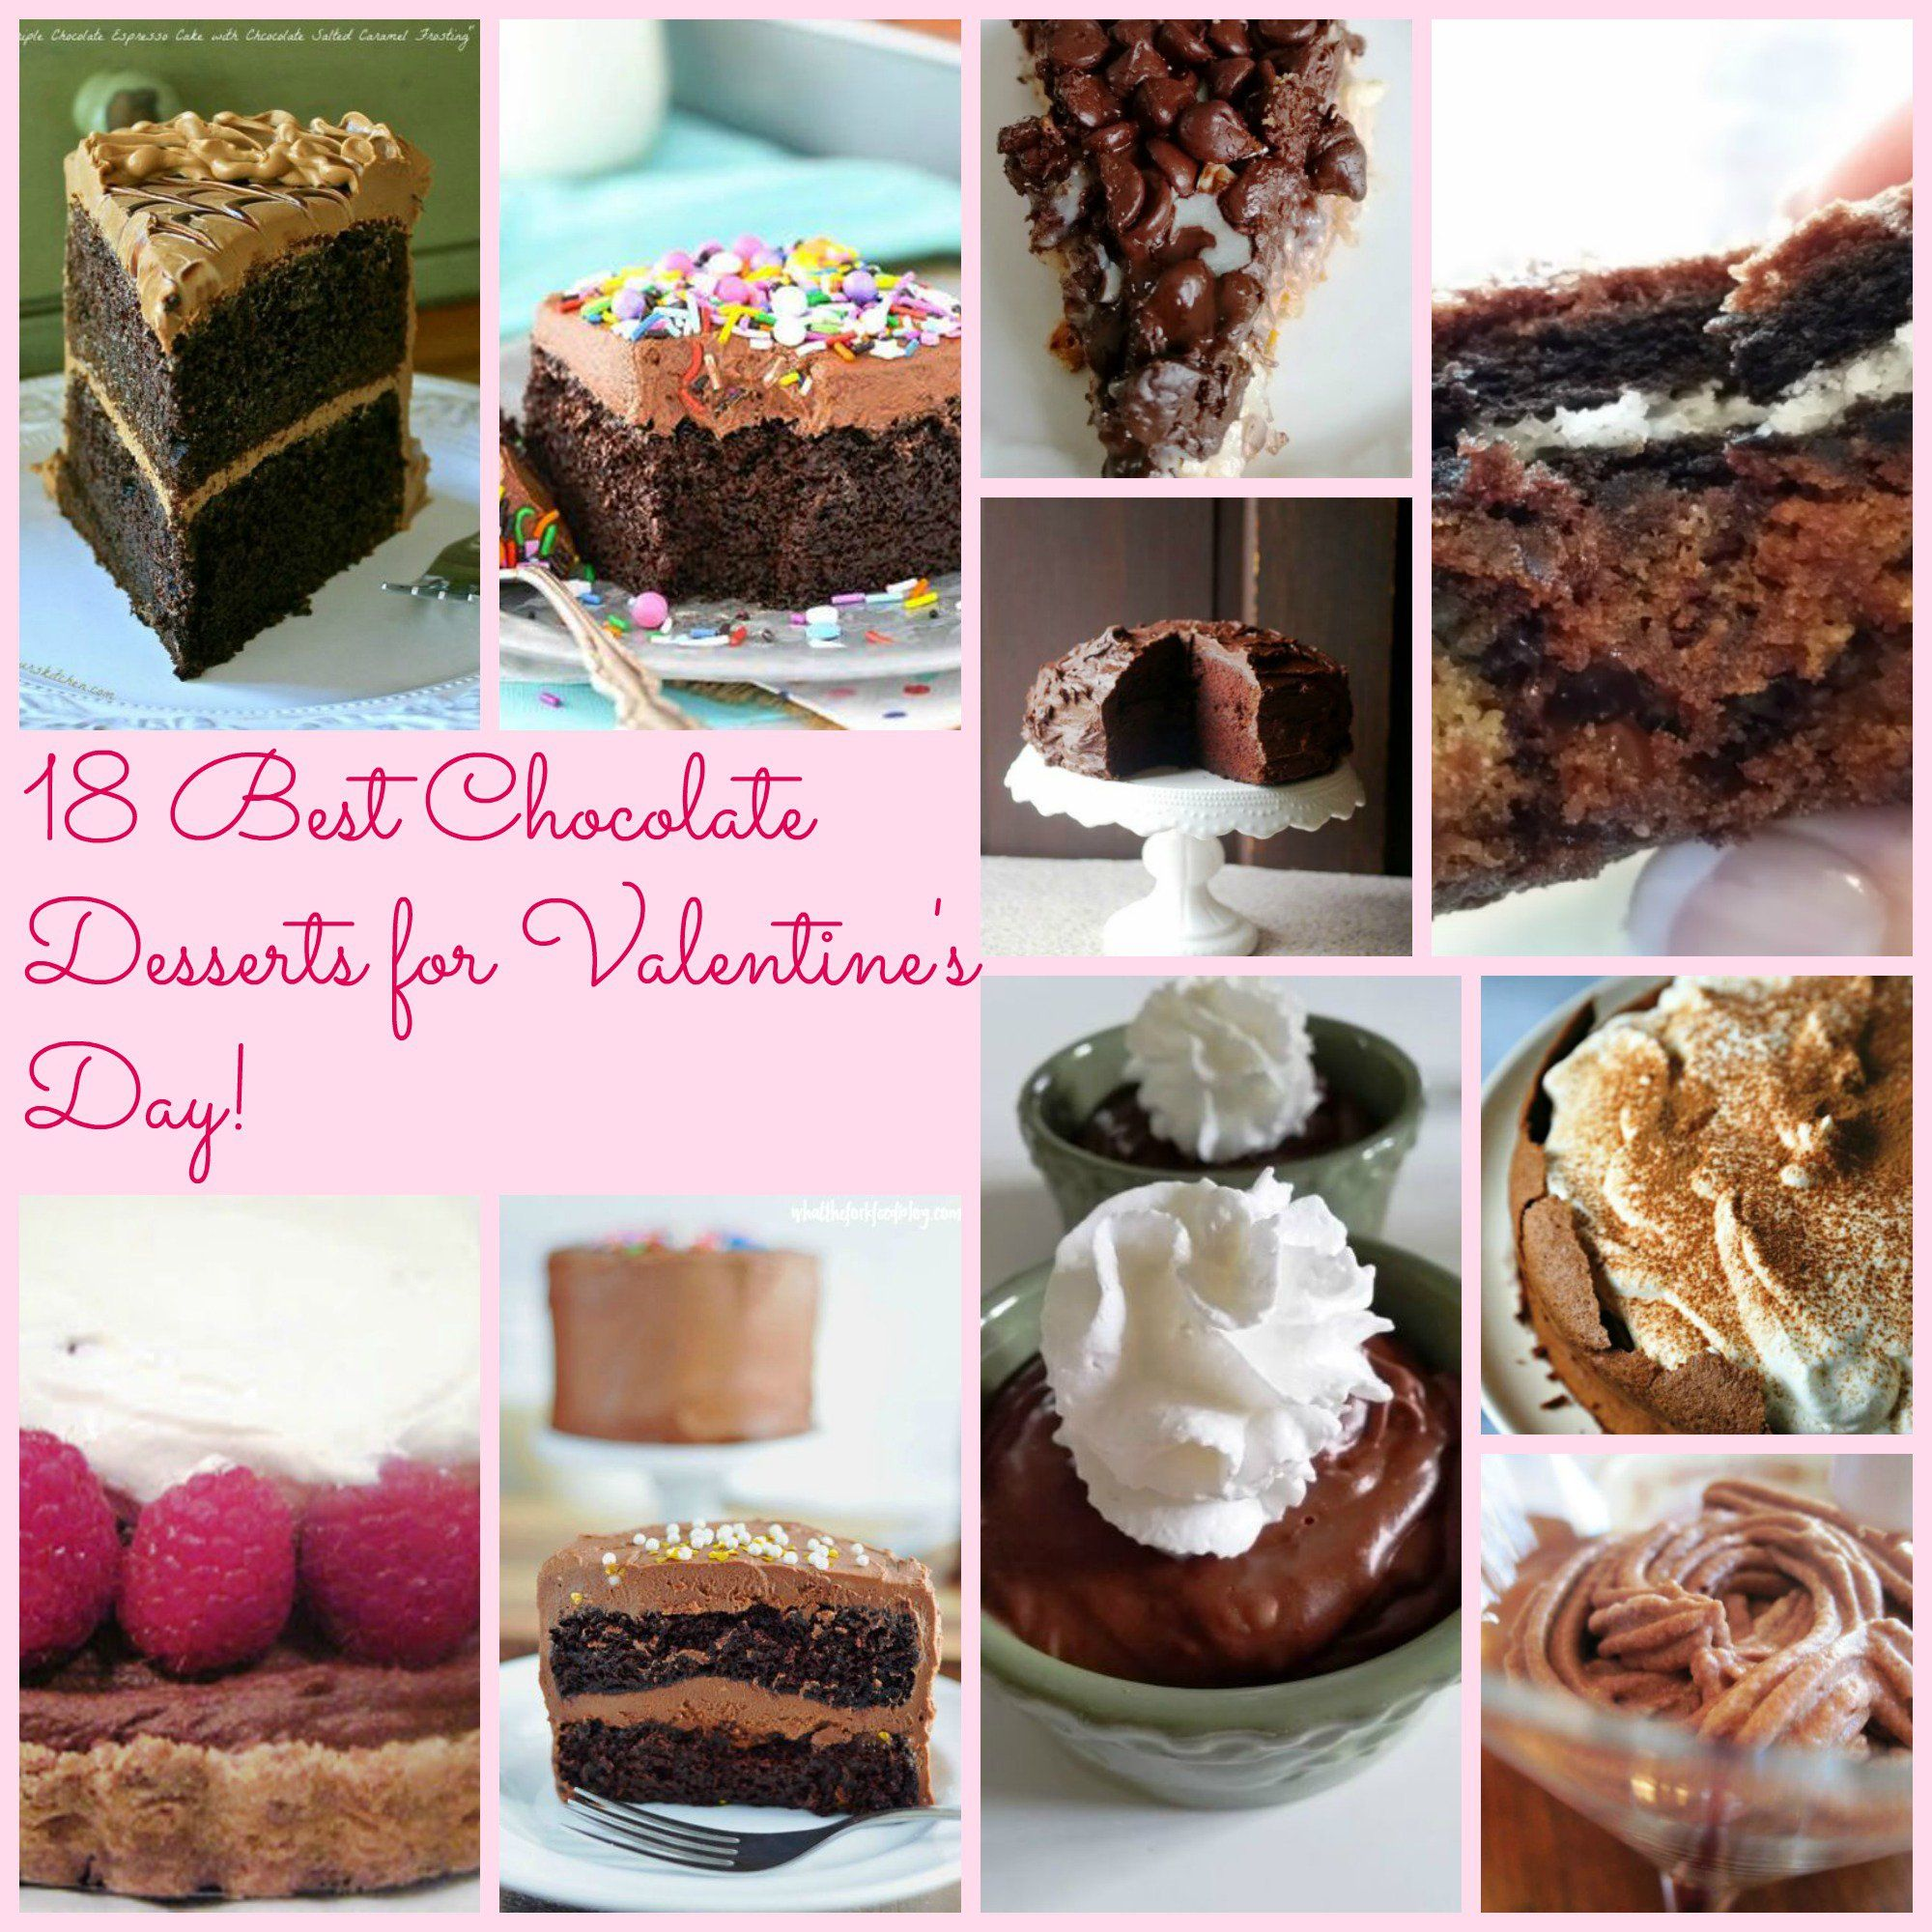 18 Best Chocolate Desserts For Valentines Day!